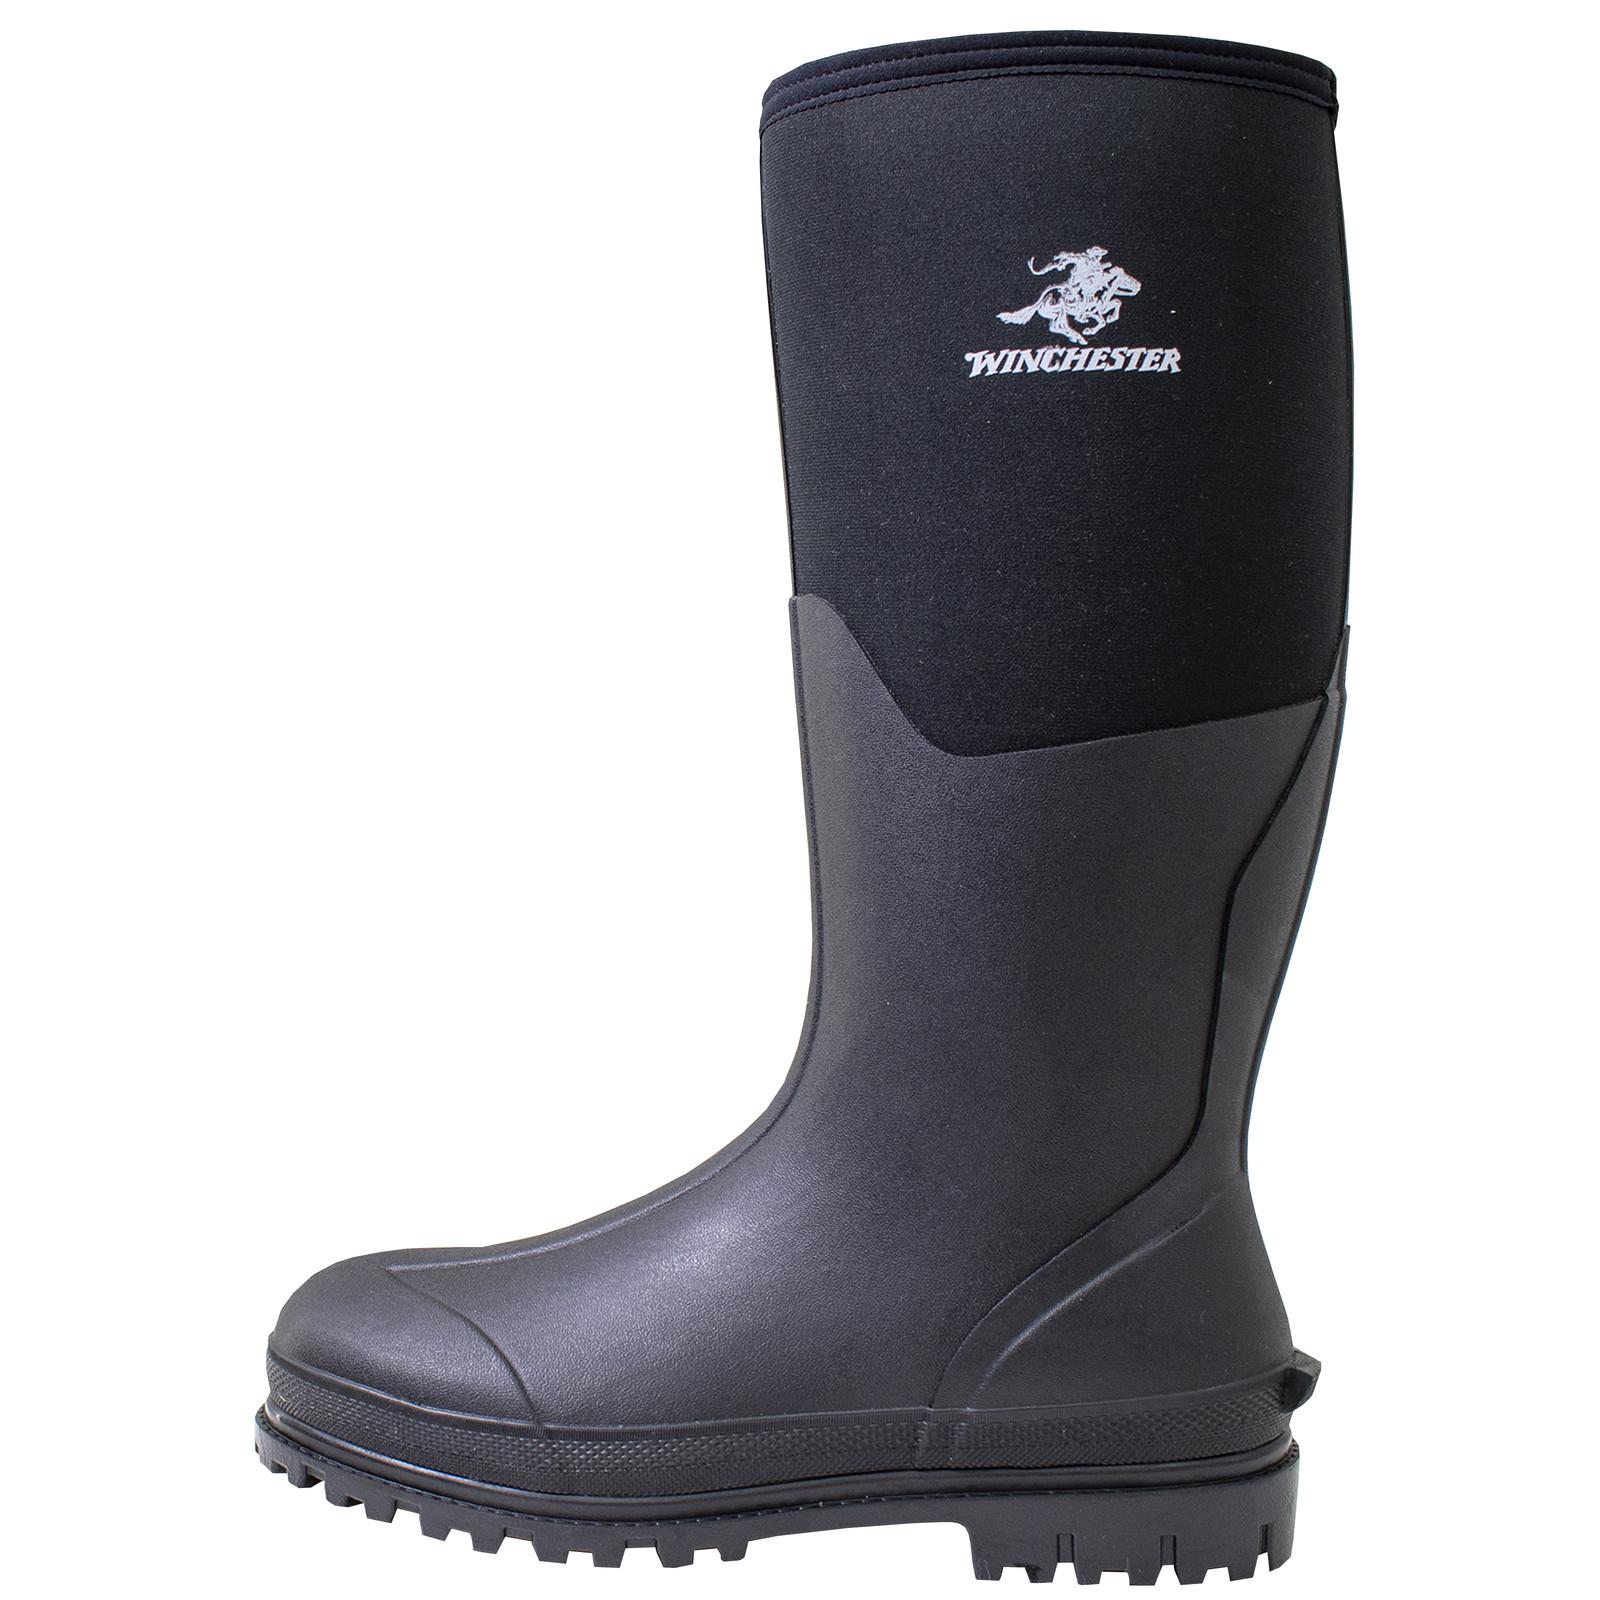 Winchester Daybreak Knee Boot Black-large